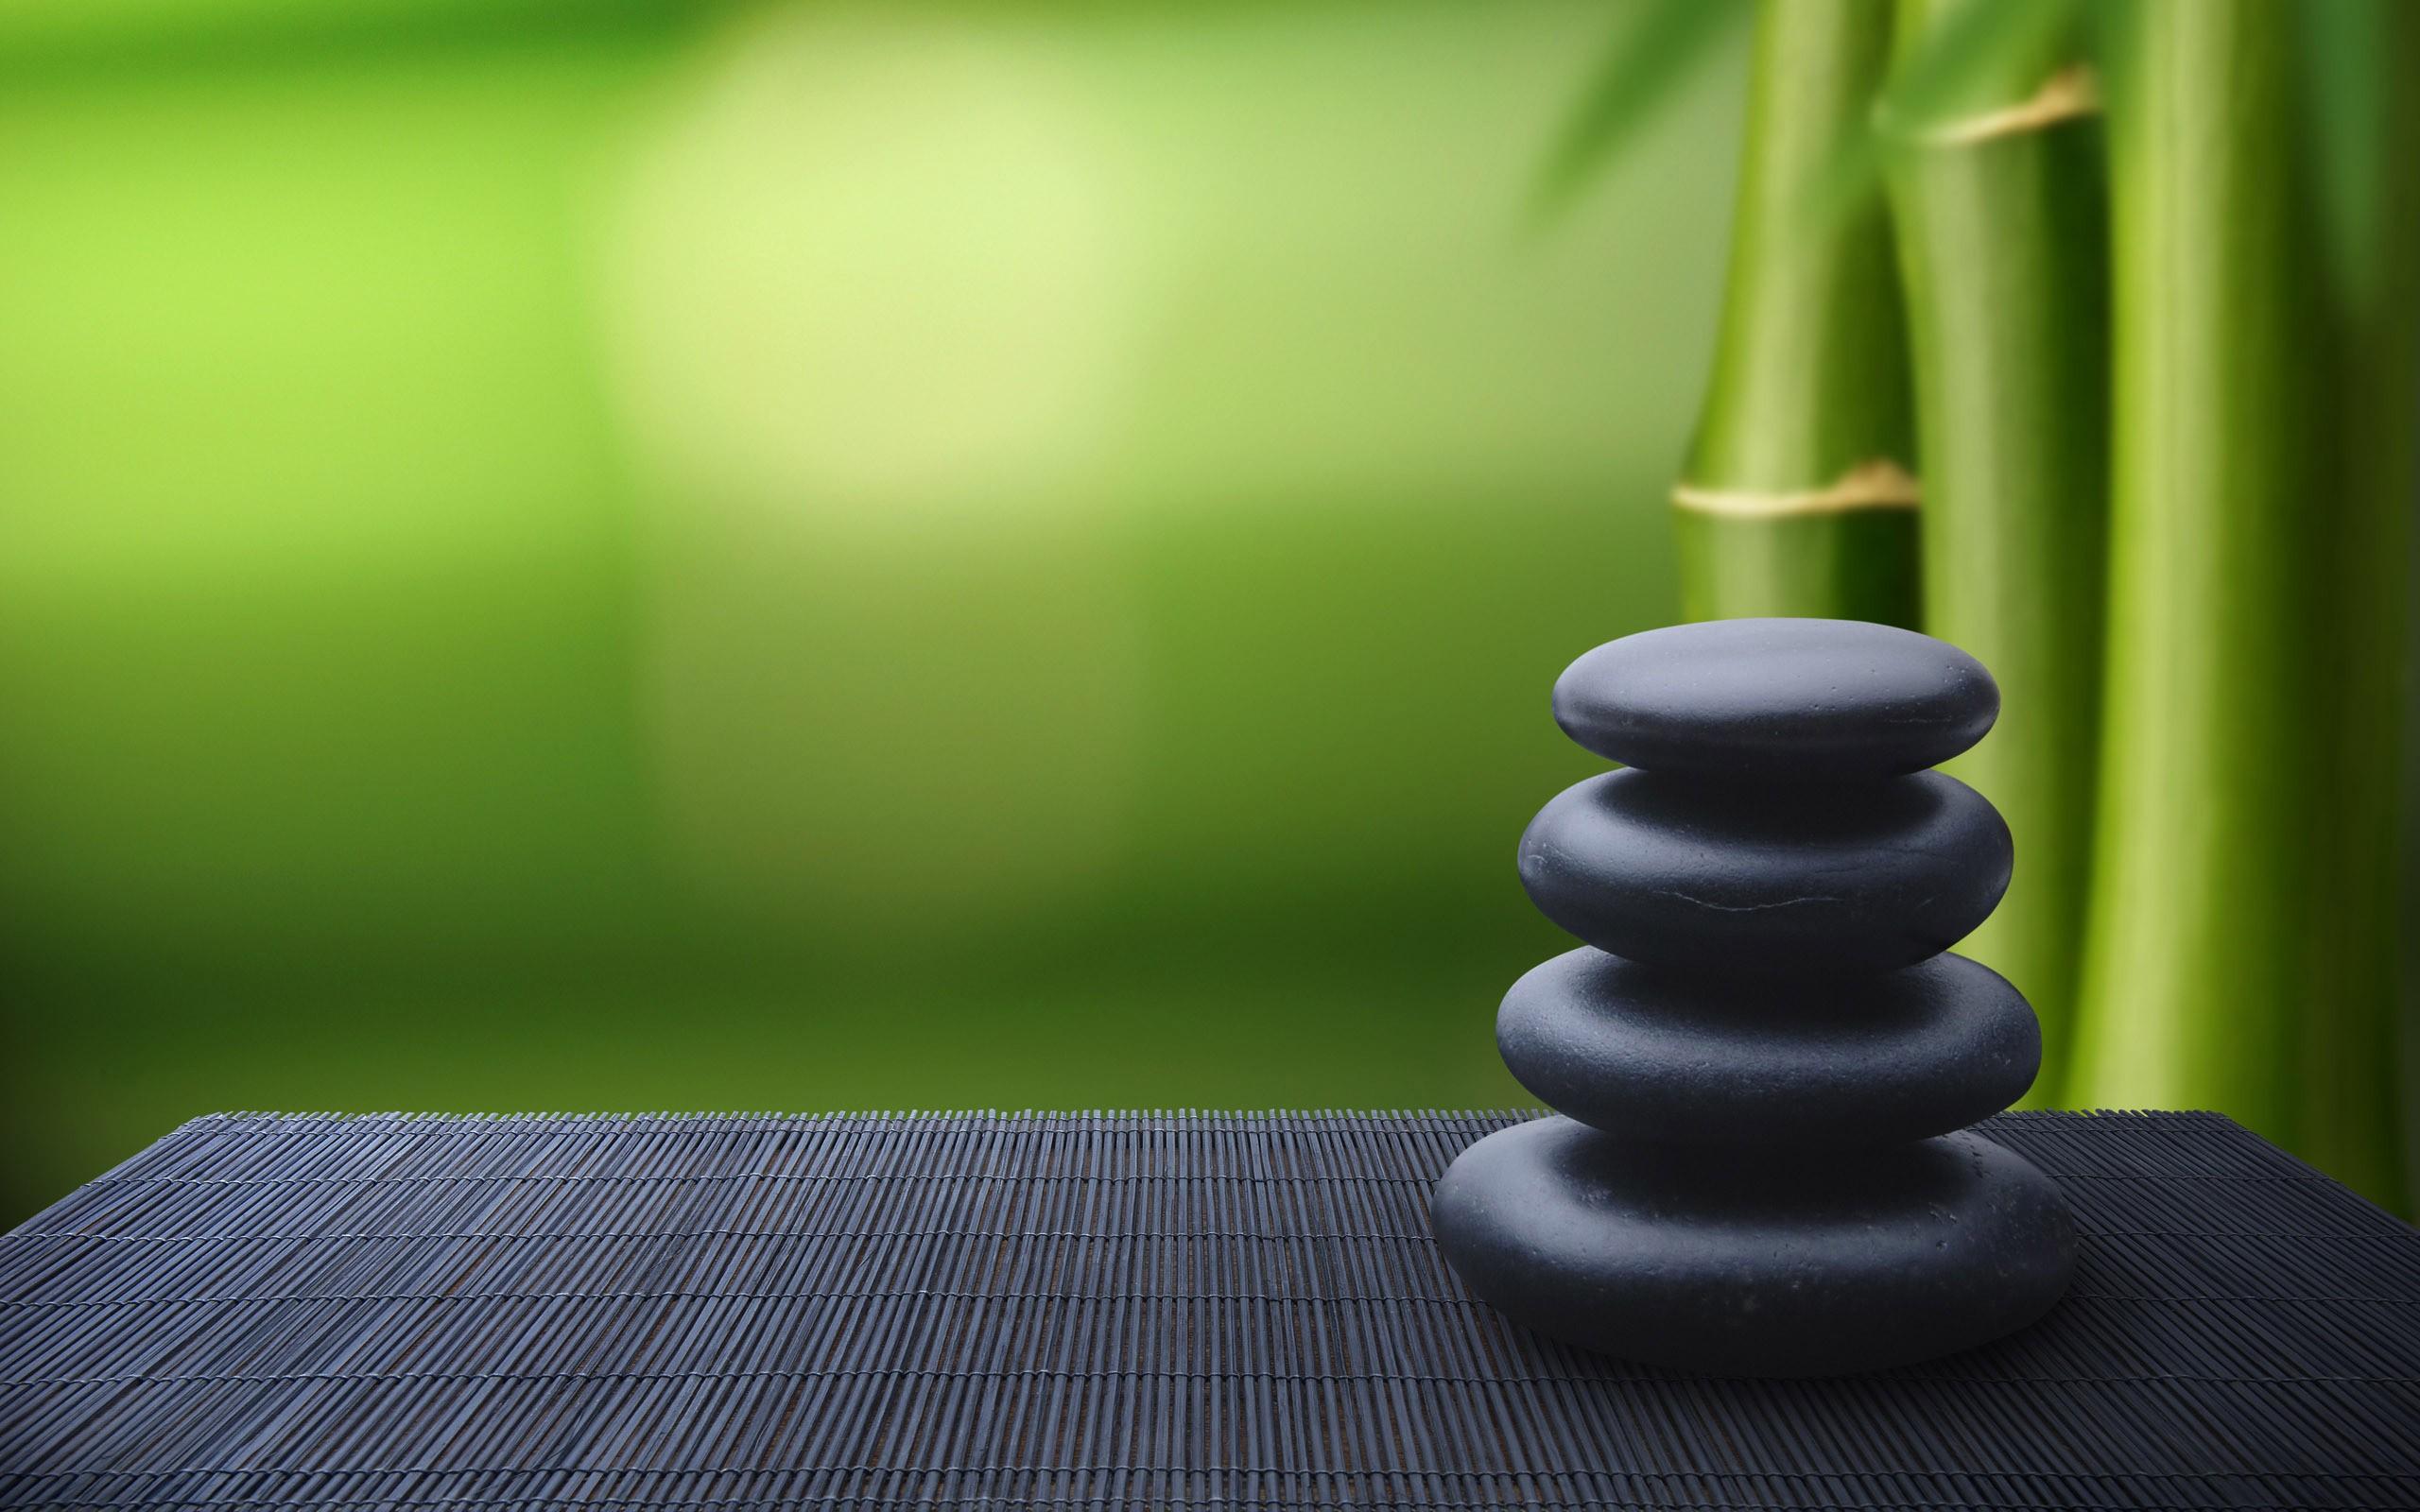 Bamboo Stones Wallpaper 2560x1600 Bamboo Stones Zen Meditation 2560x1600